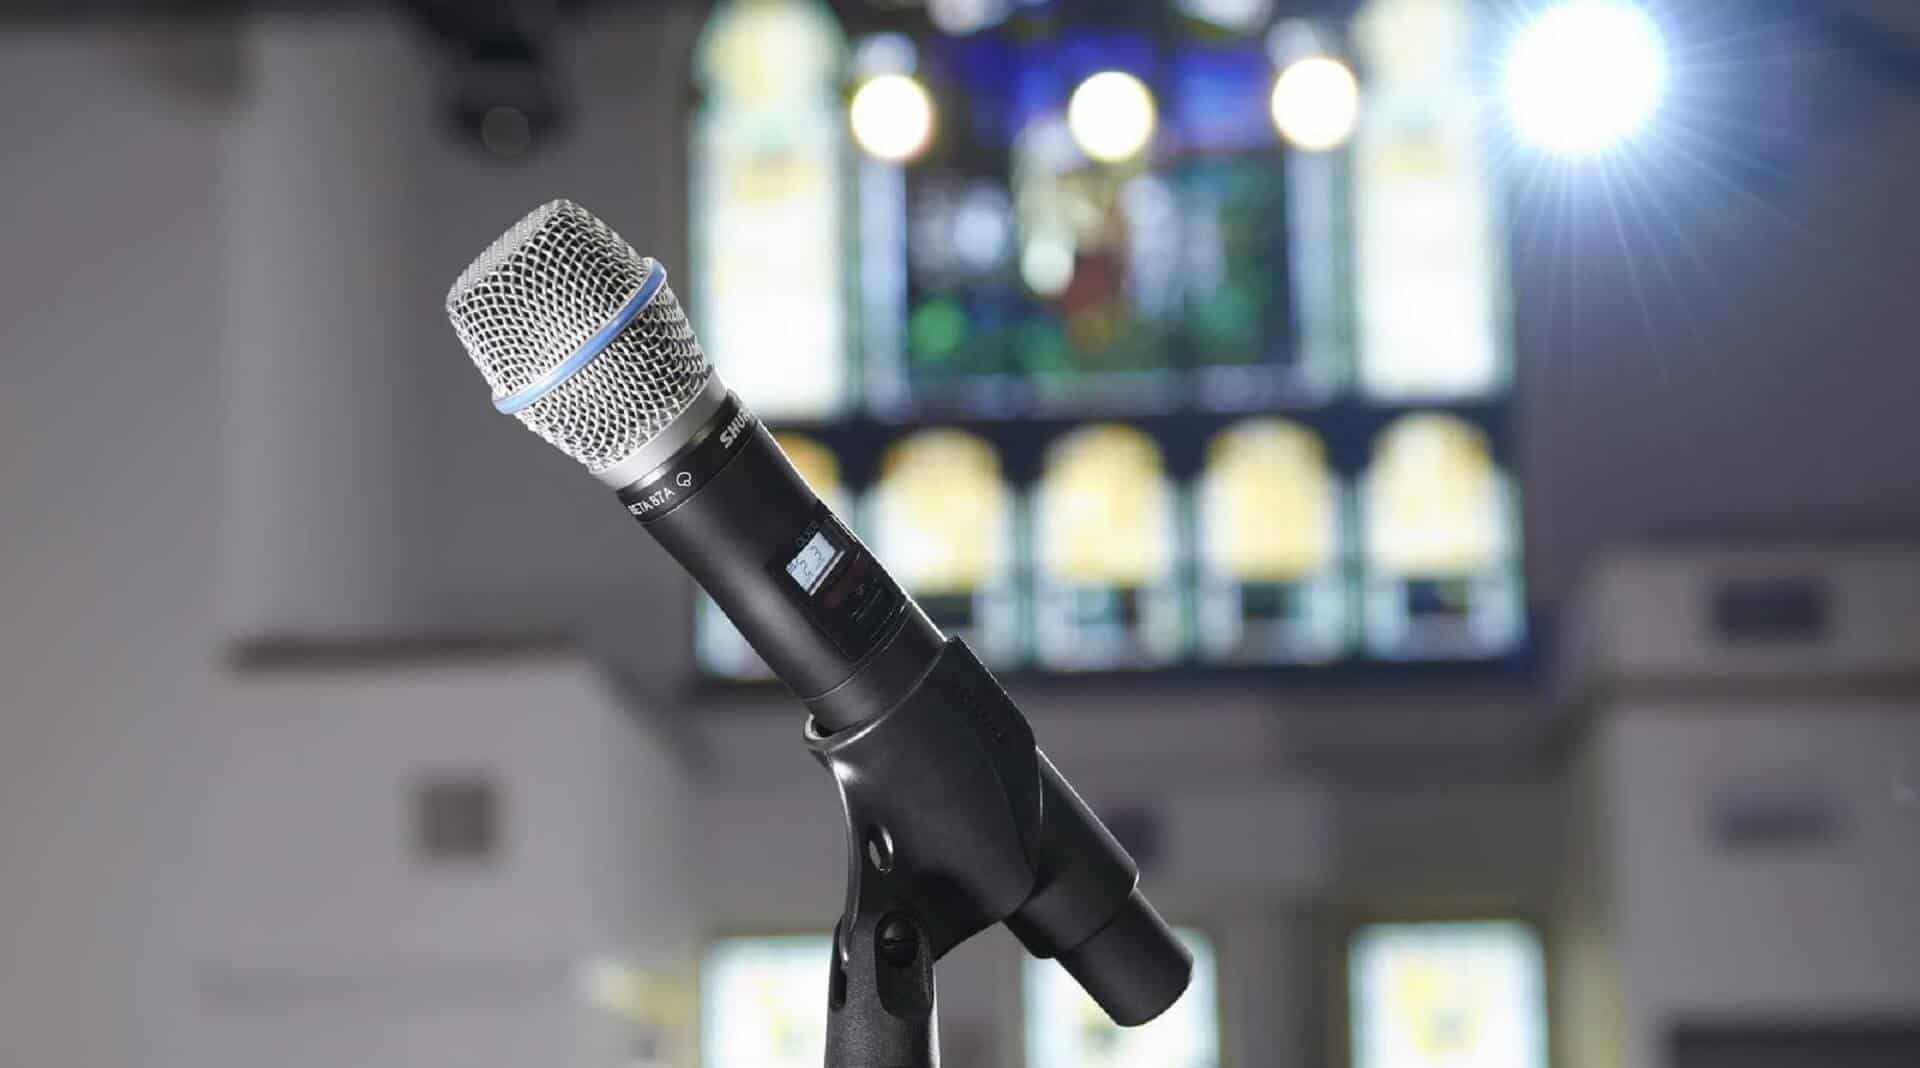 microphone rental company